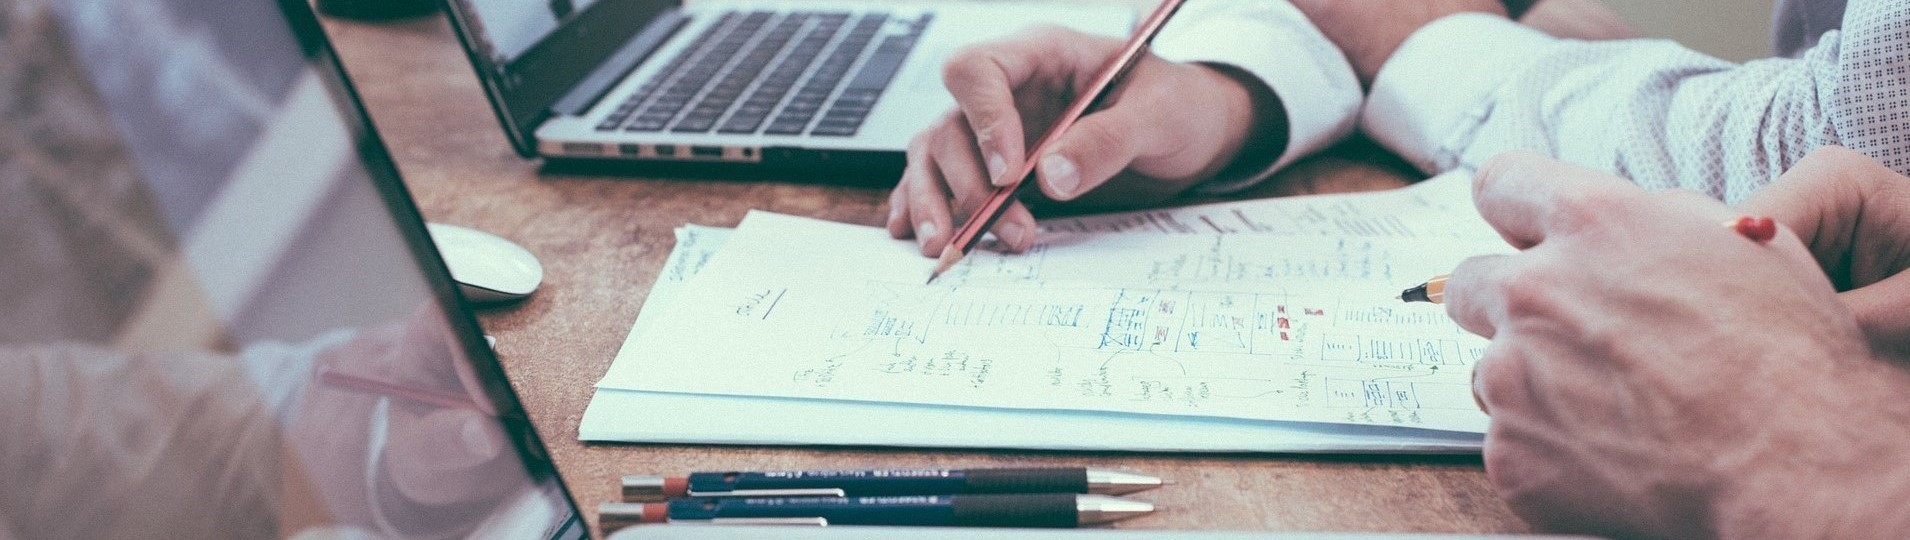 emprendedores startups